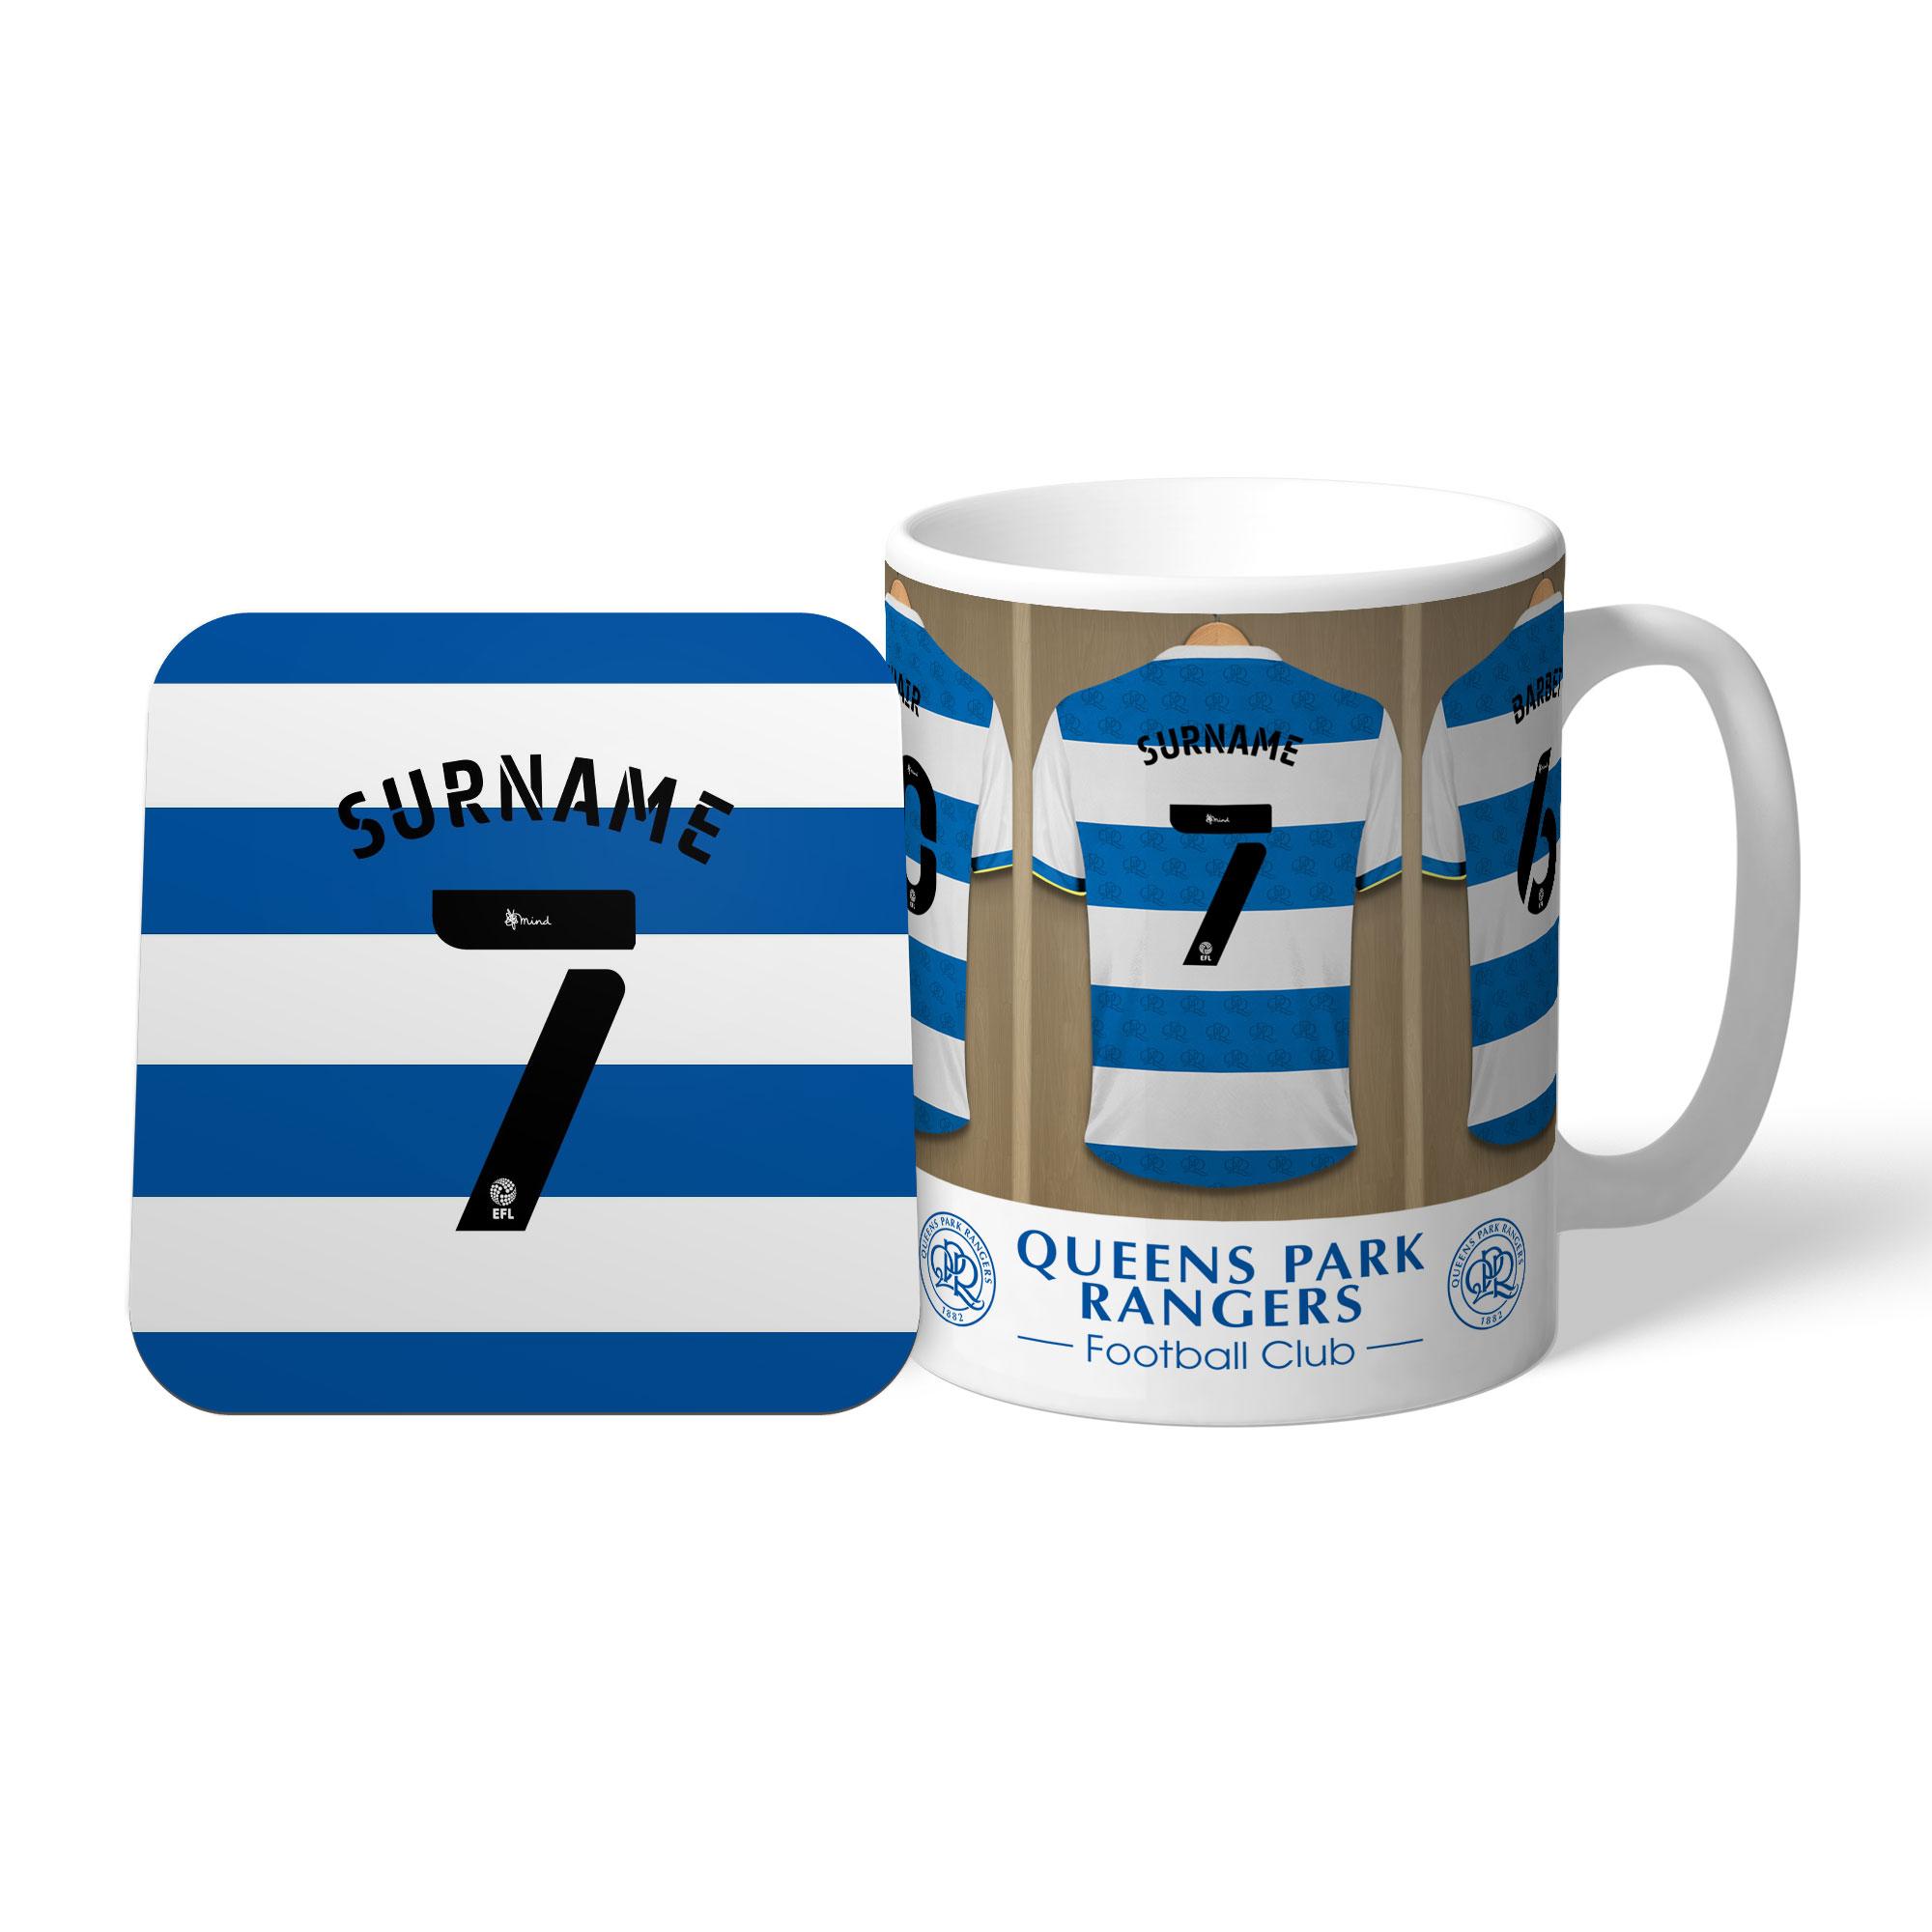 Queens Park Rangers FC Dressing Room Mug & Coaster Set